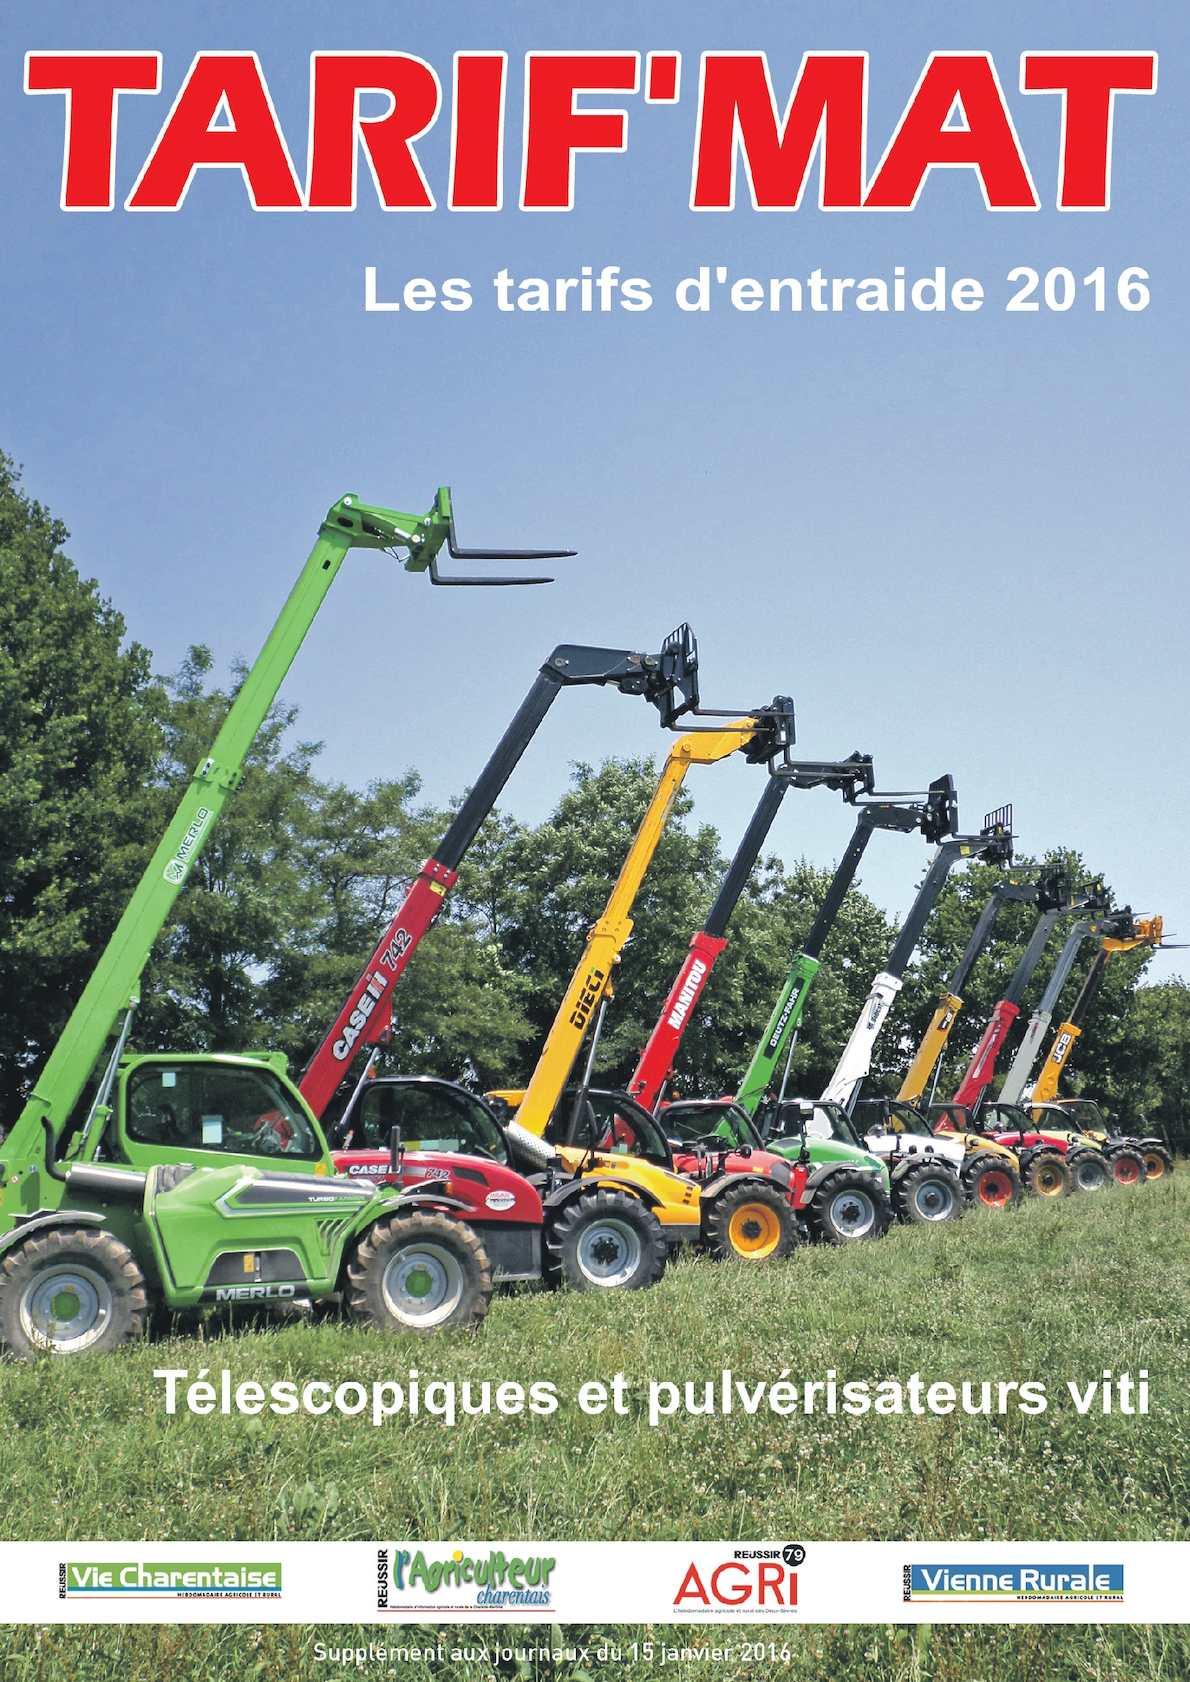 Calam o tarif mat 2016 - Chambre agriculture poitou charentes ...